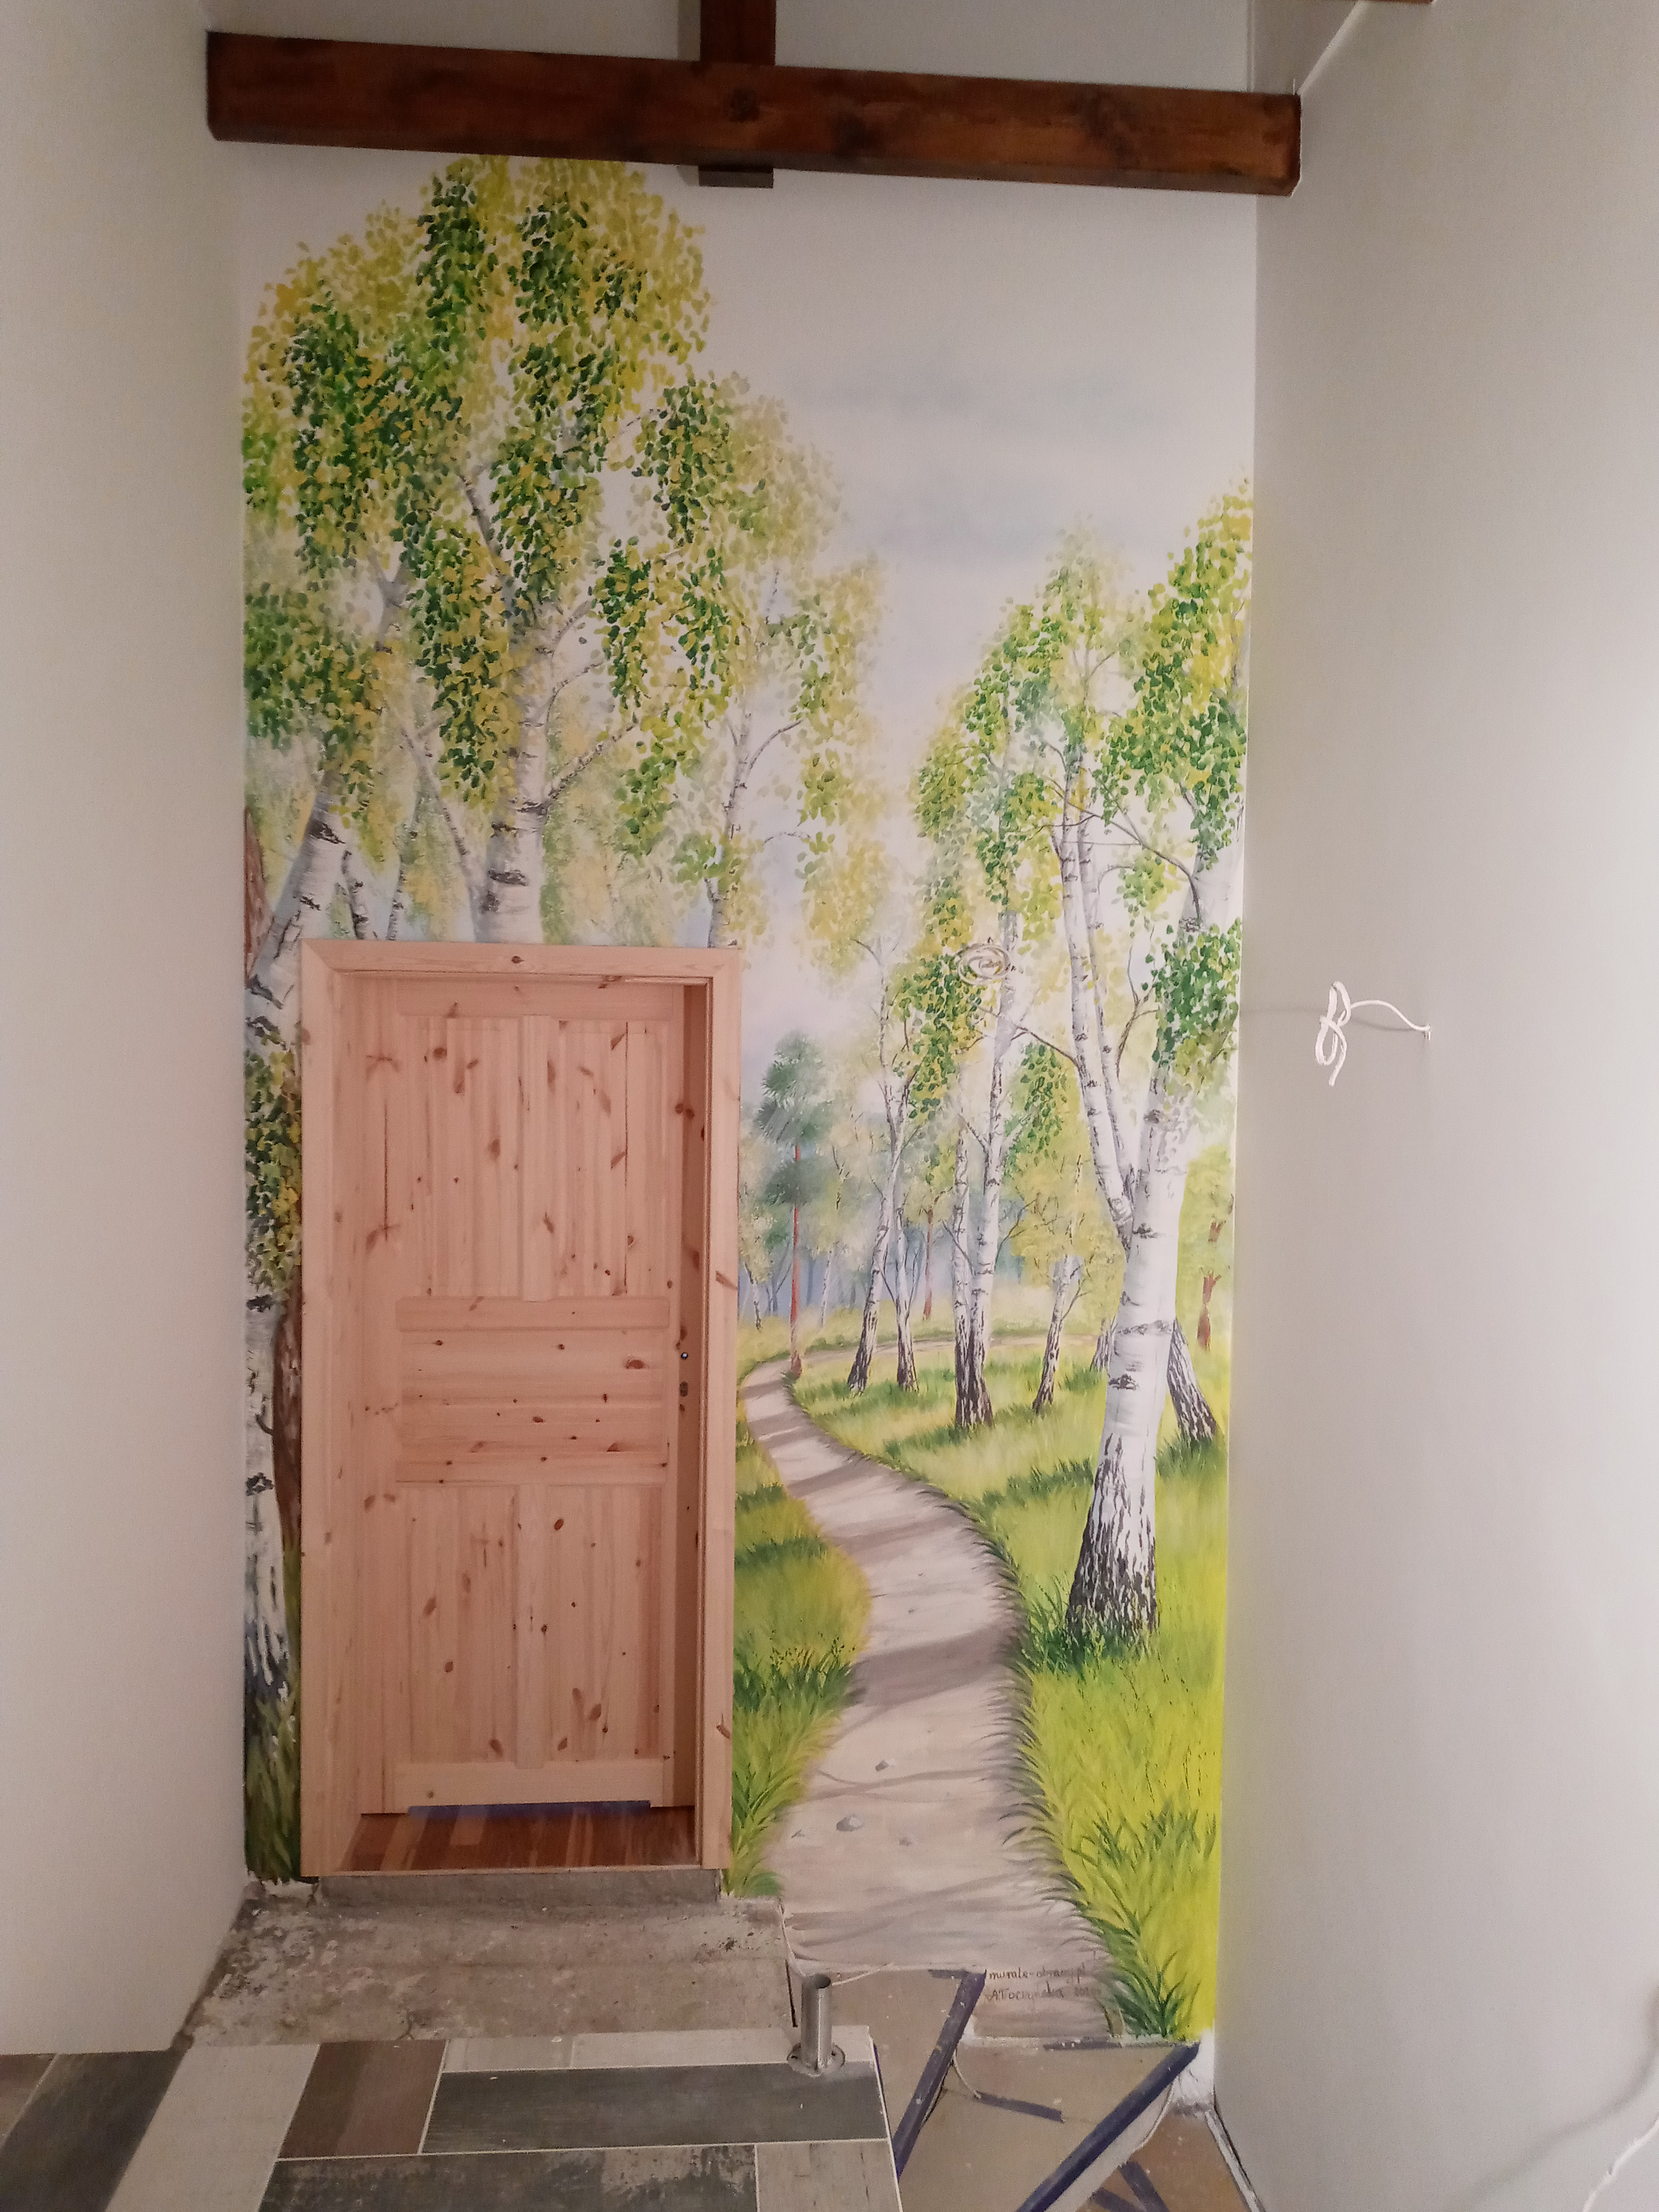 mural z brzozami